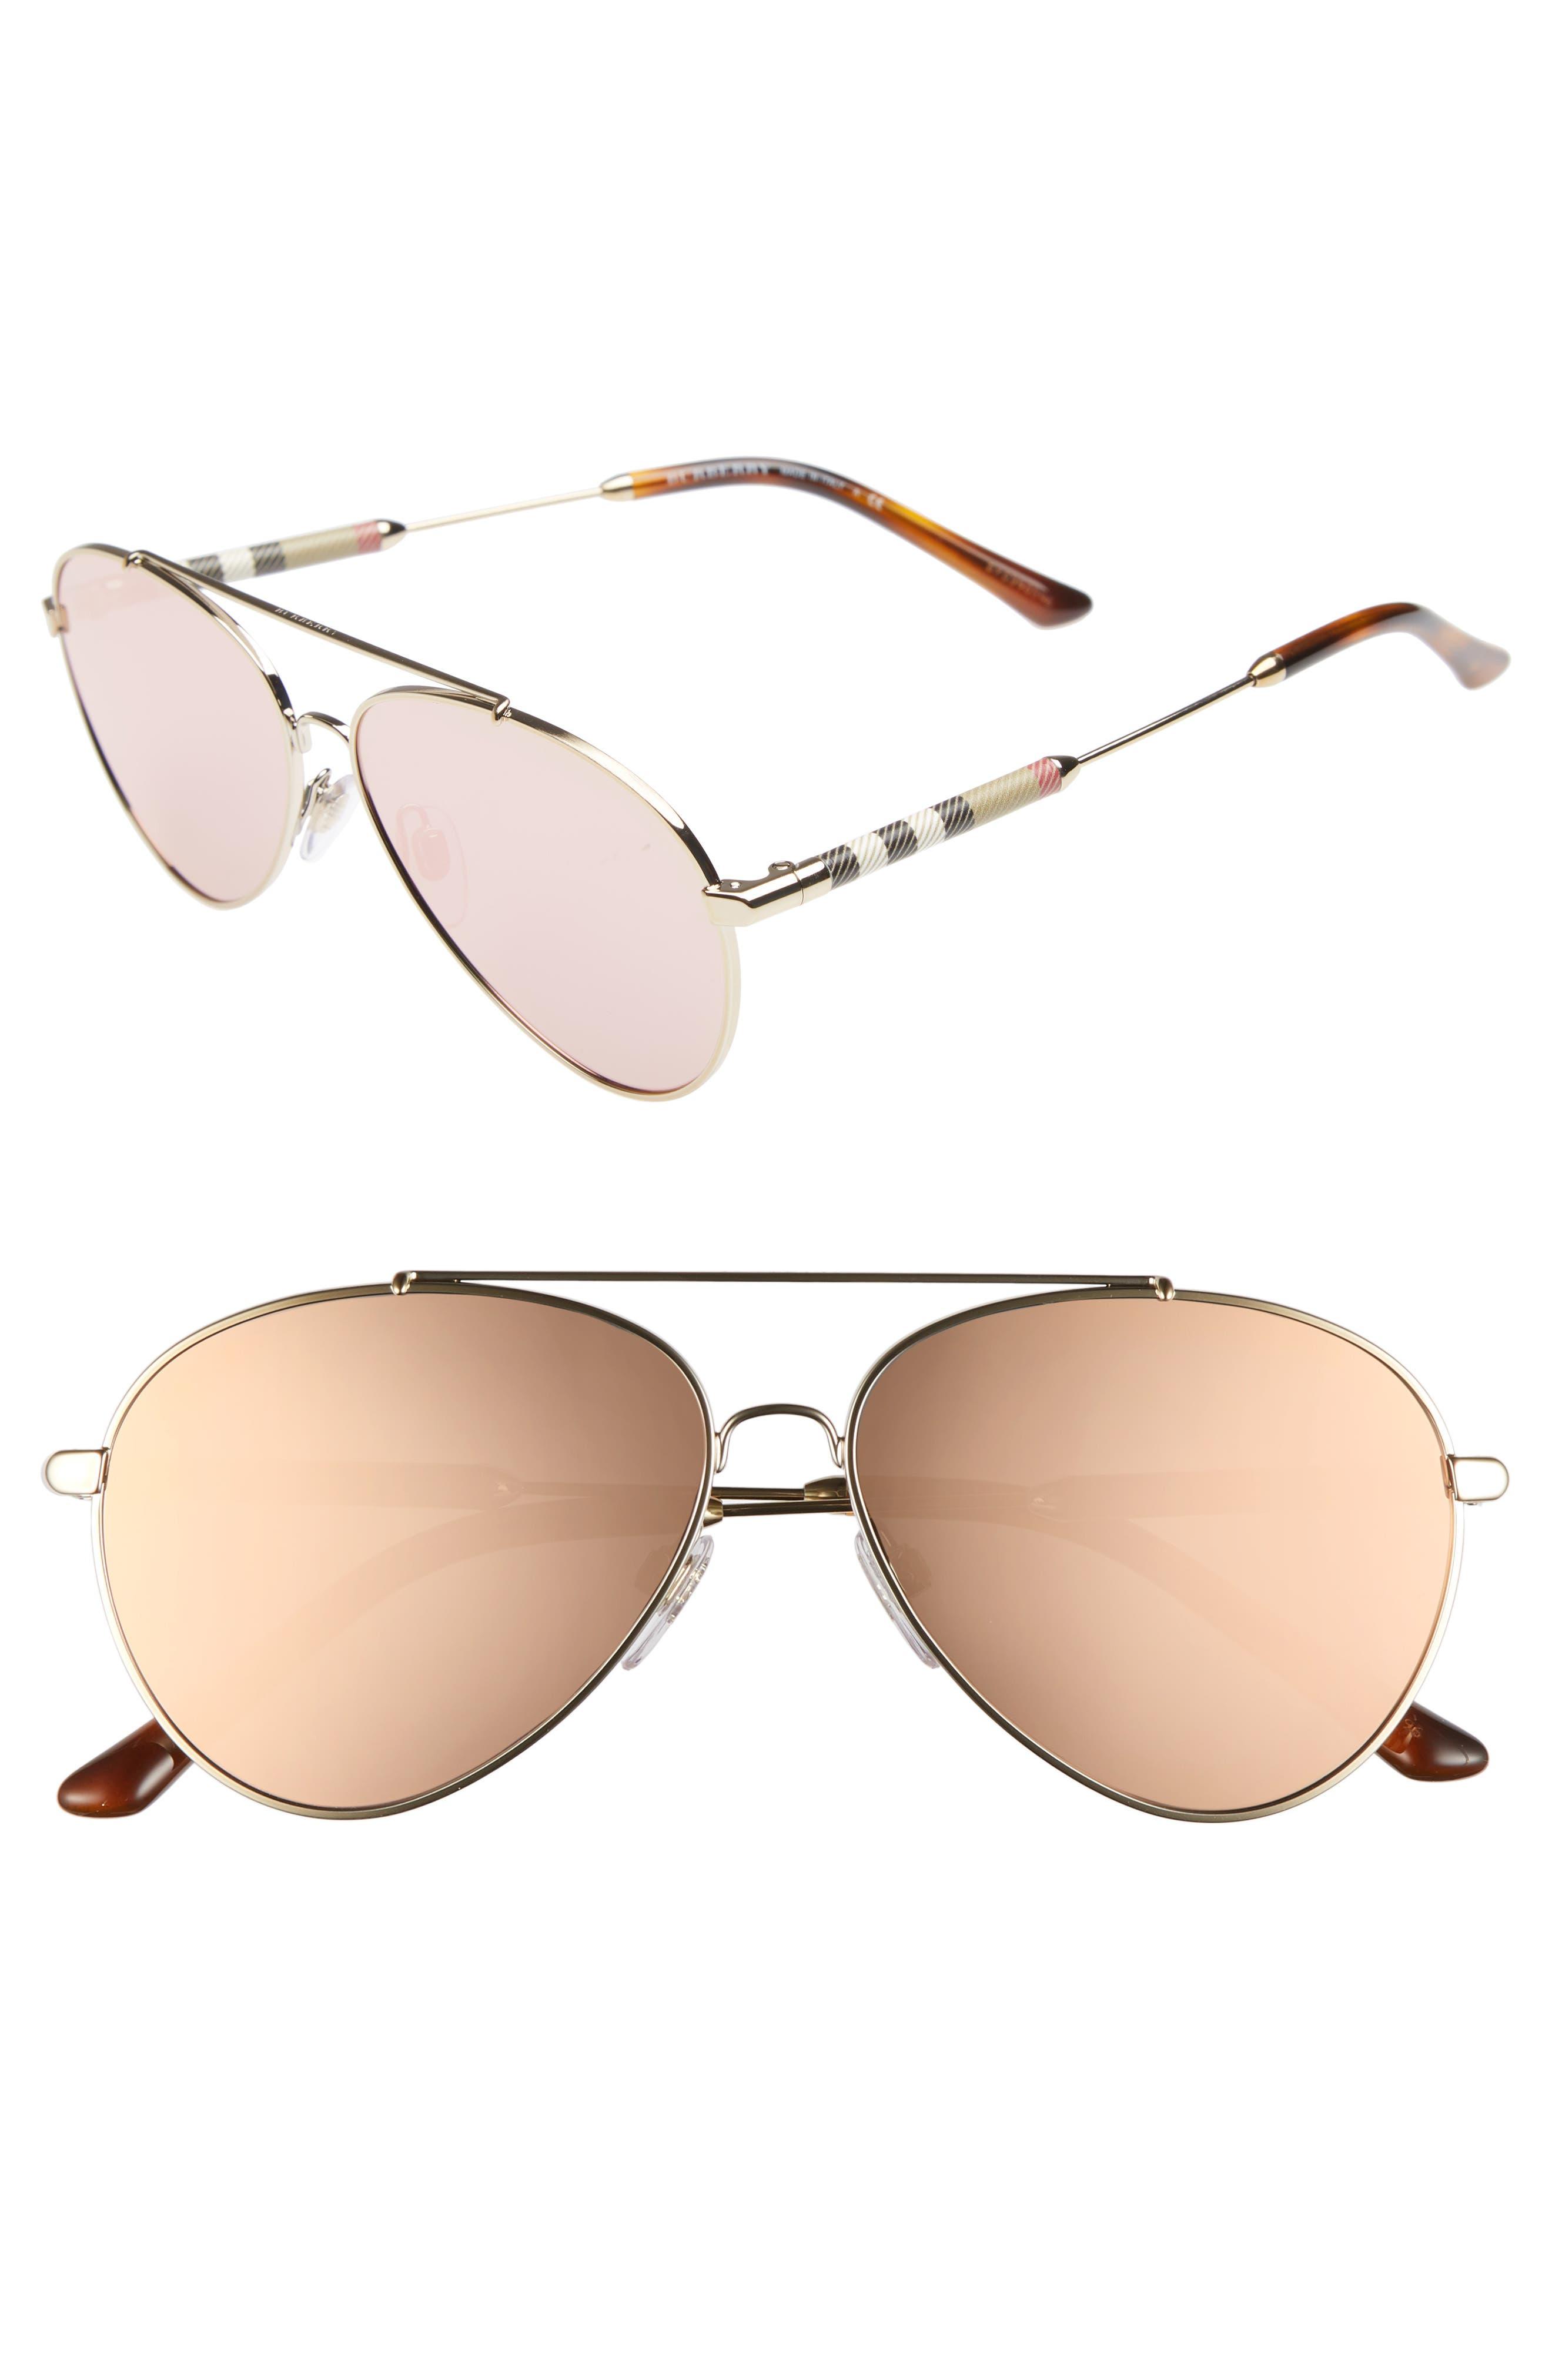 57mm Mirrored Aviator Sunglasses,                         Main,                         color, 031